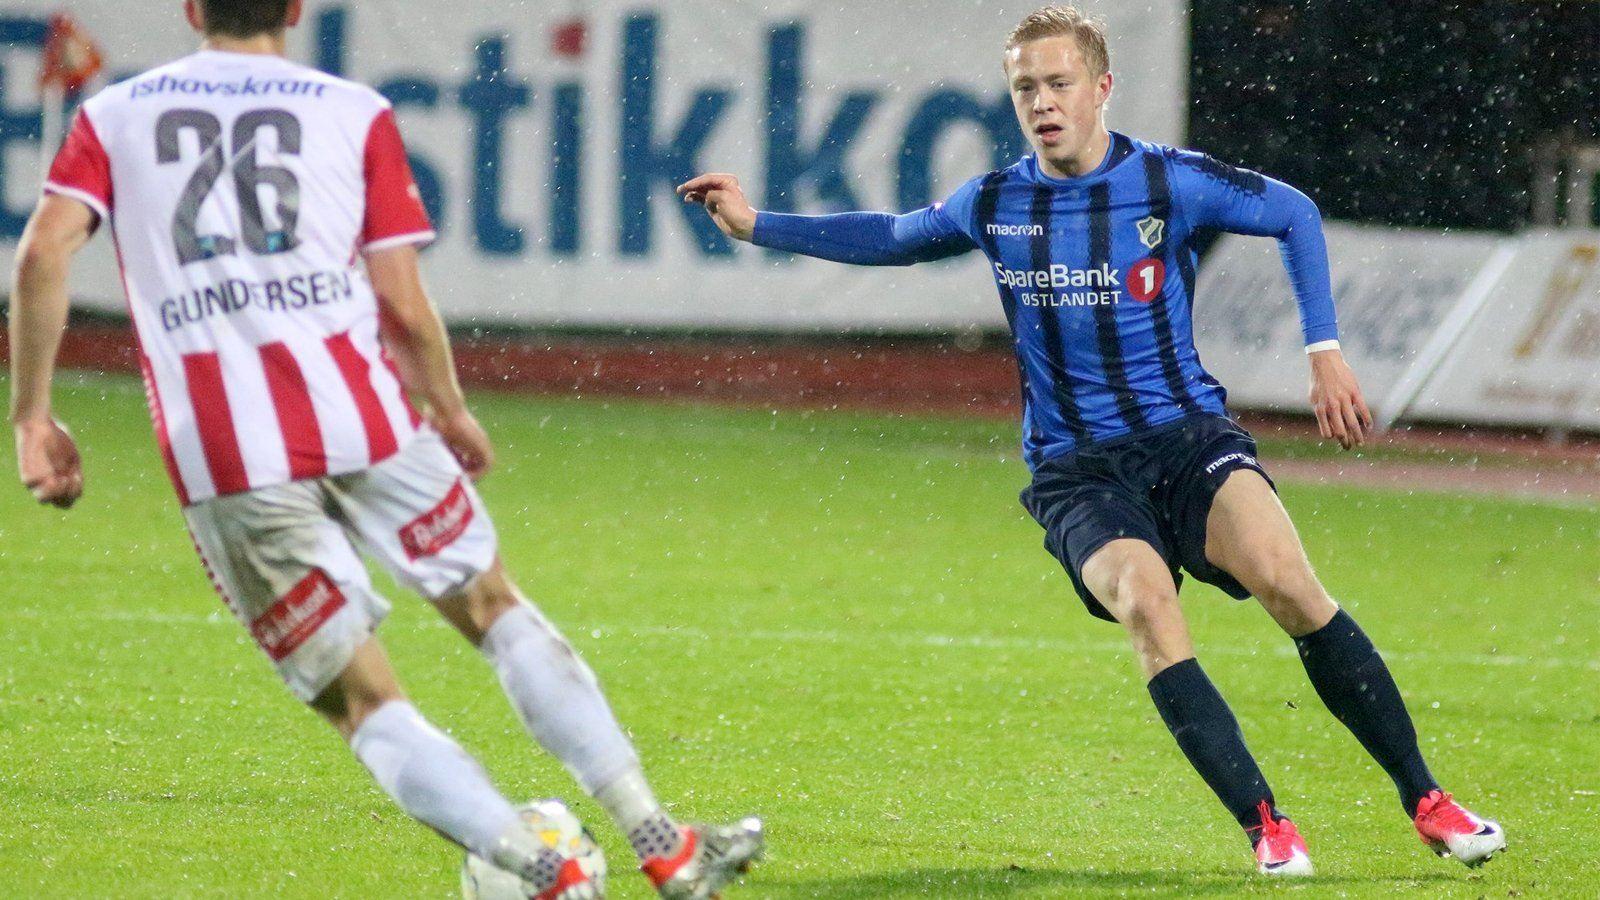 Ponturi pariuri Stabaek vs Tromso - Norvegia Eliteserien - 17 iunie 2019 Fotbal Pariuri Online Ponturi pariuri